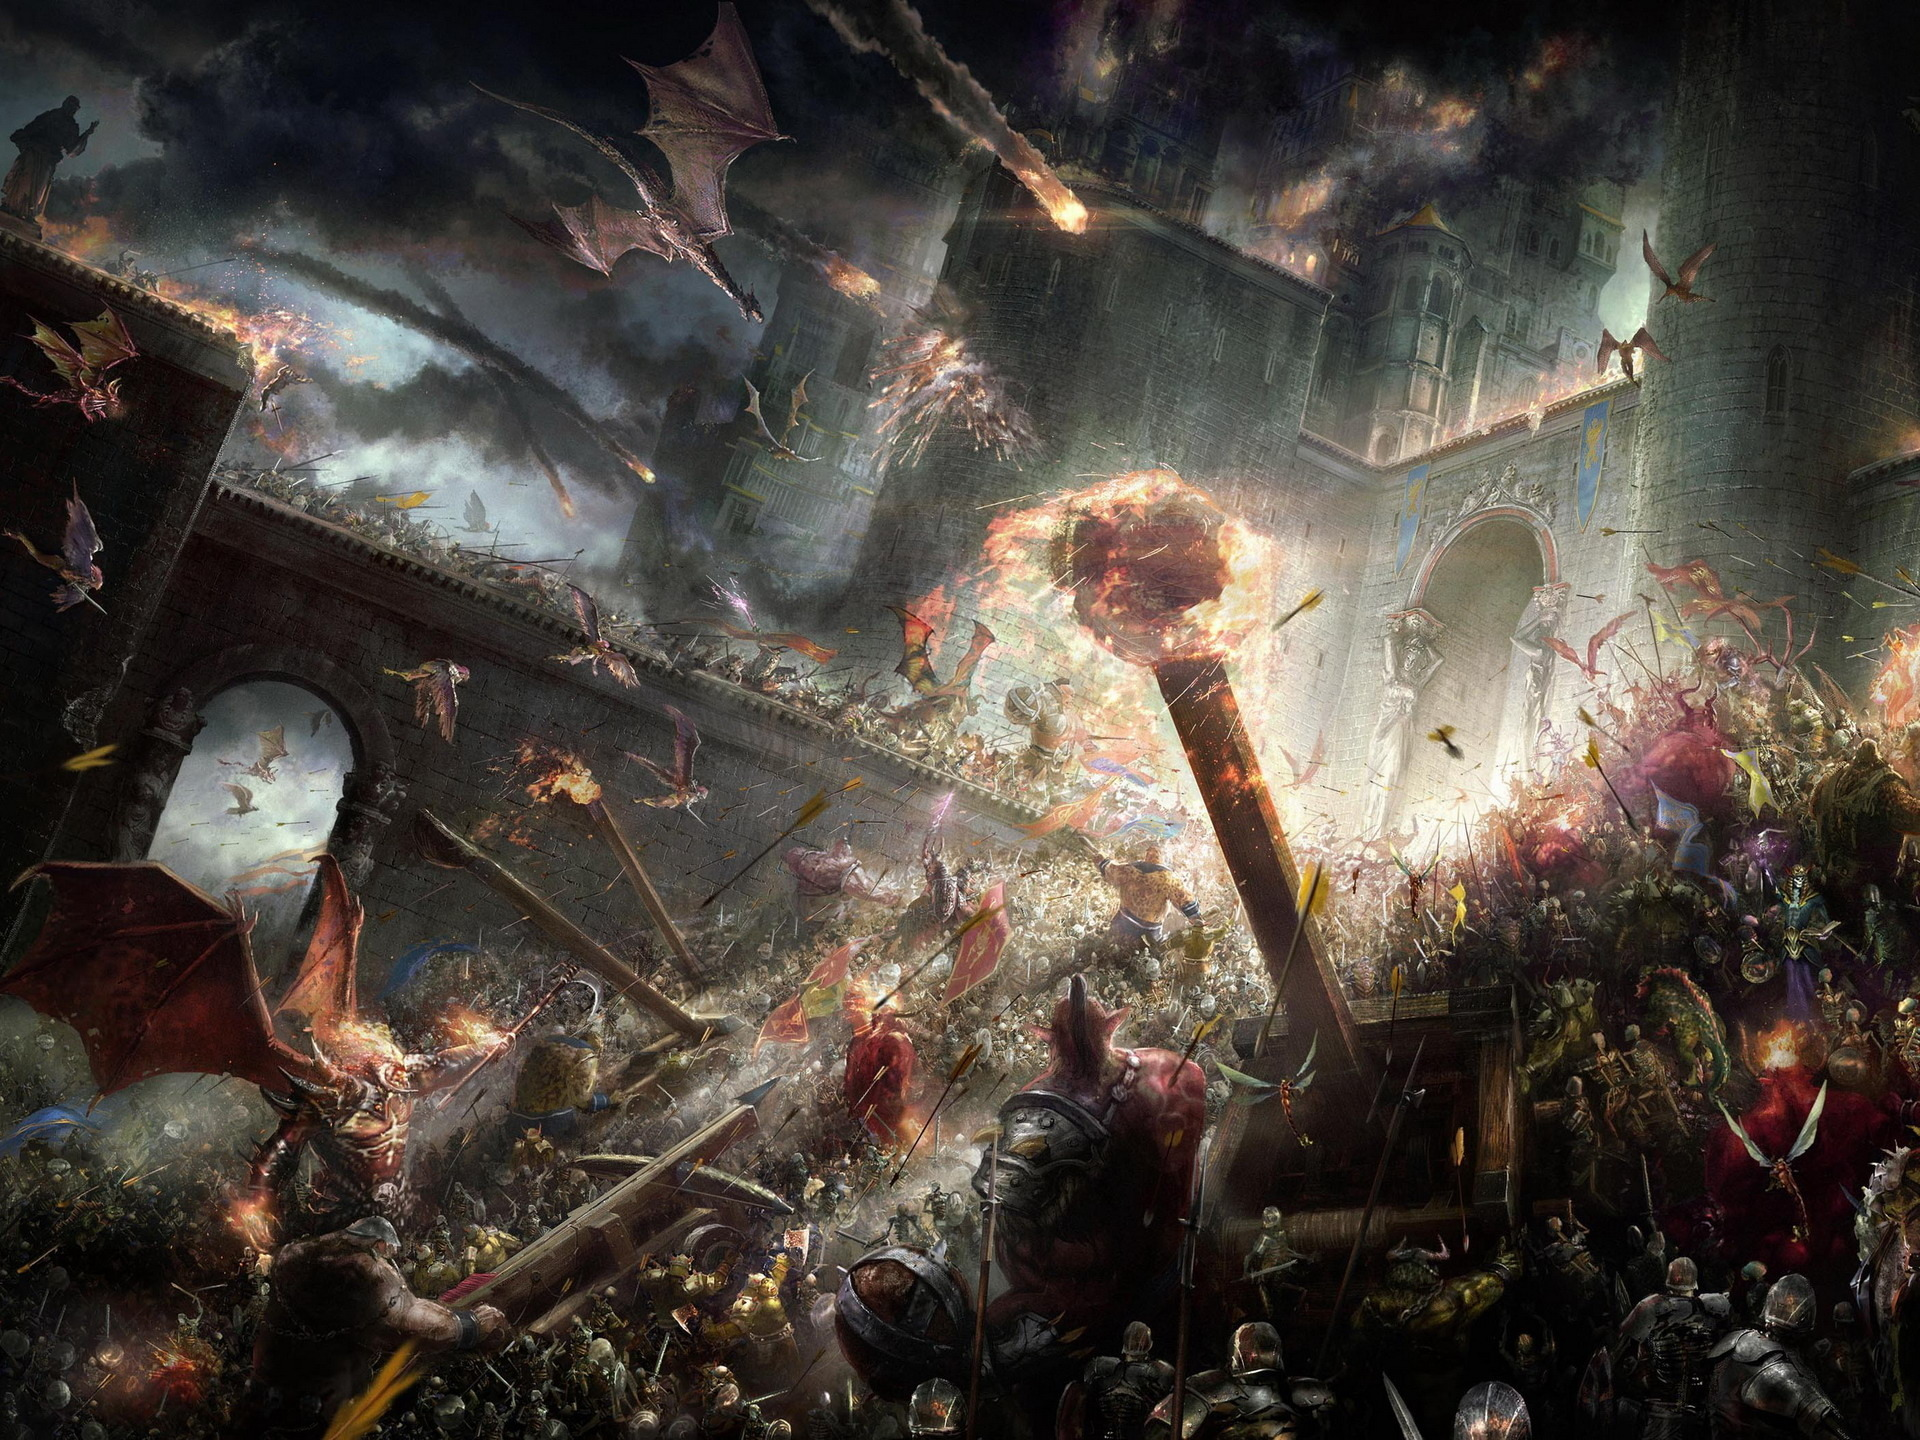 Género Fantástico - Batalla  - Dragones - Guerreros - Weapon - Castillos - Fire Fondo de Pantalla